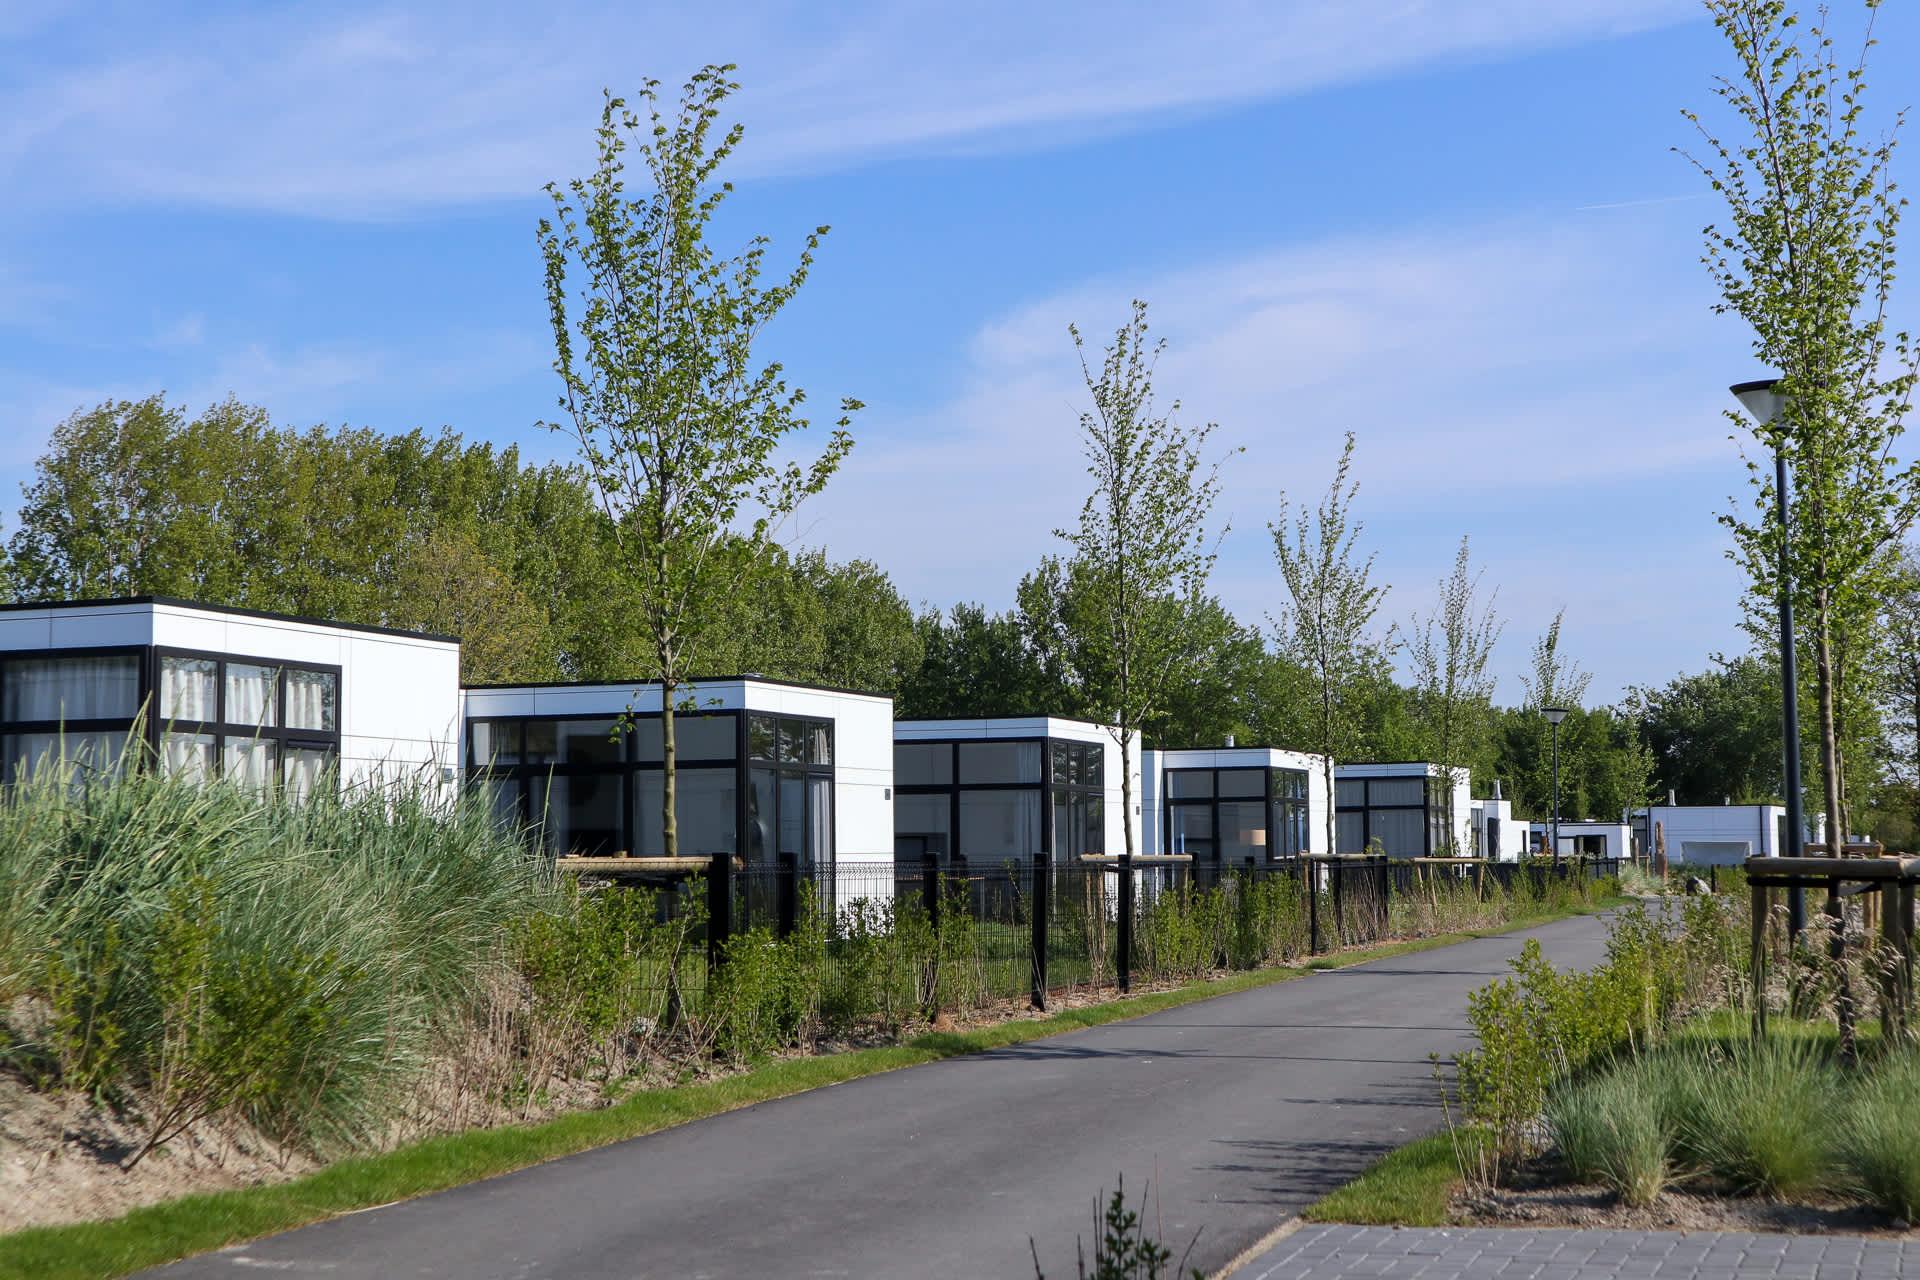 header-accommodations-park-lane-europarcs-schoneveld